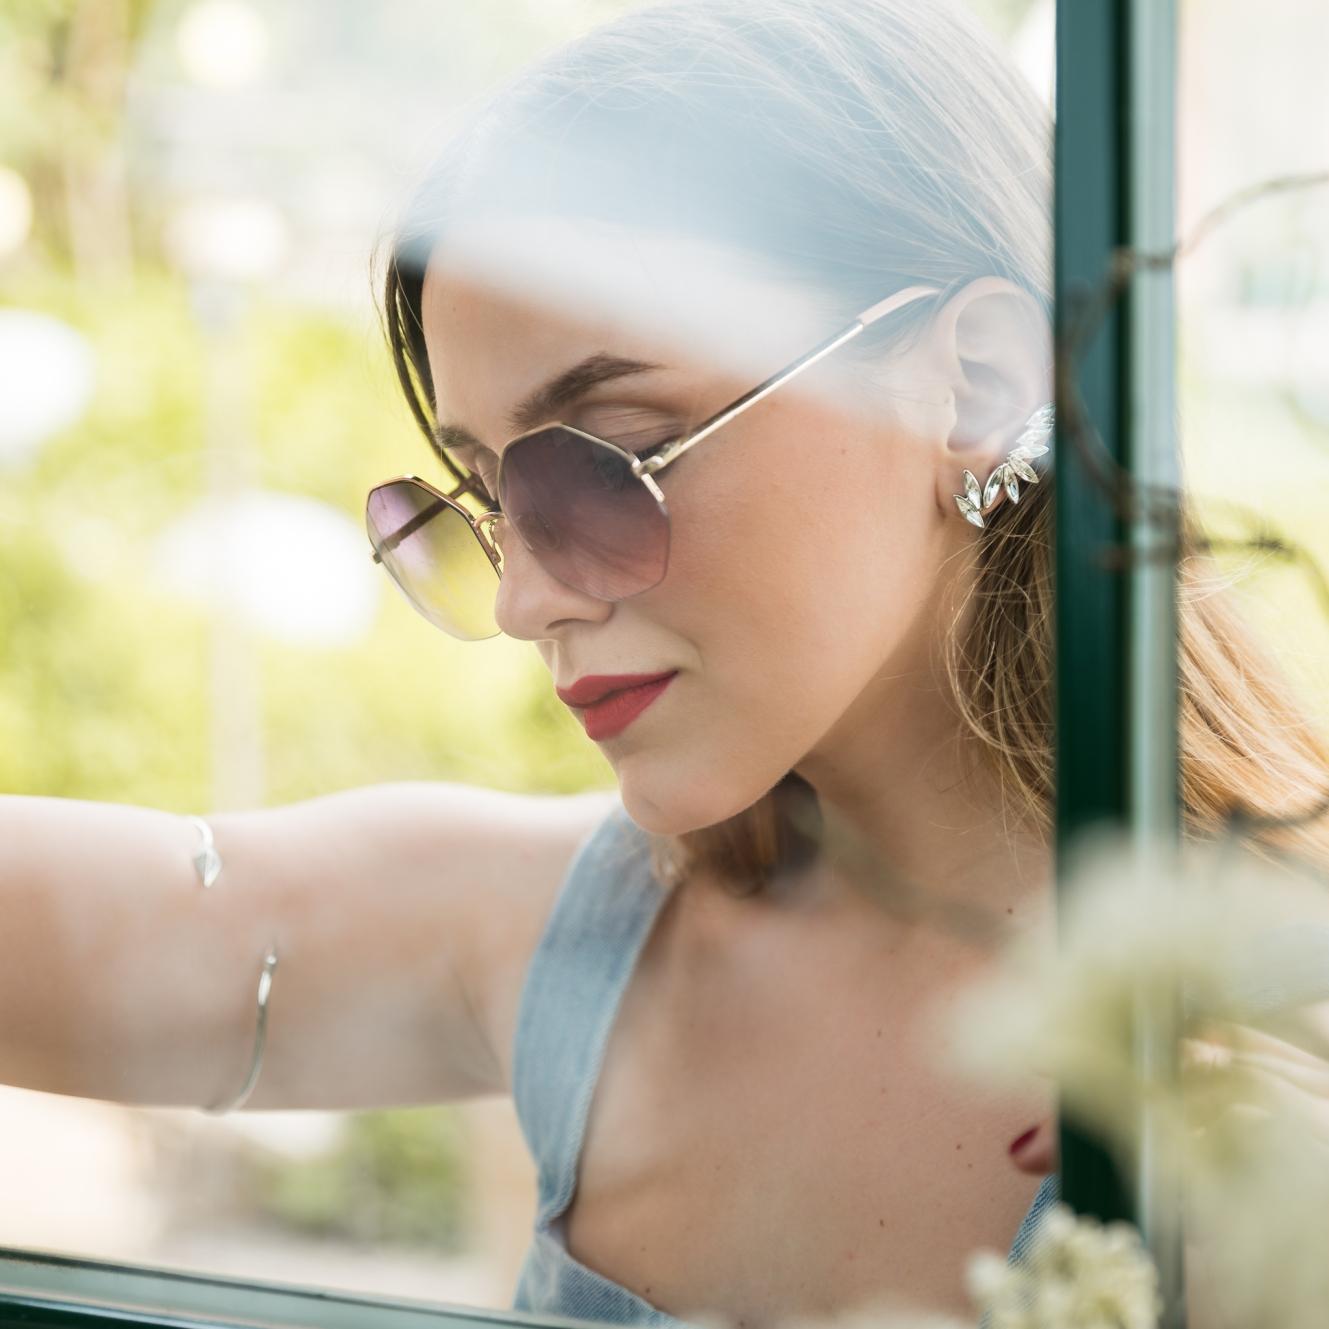 martin-phox-fashion-photography-cadenzza-fleurdemode-8